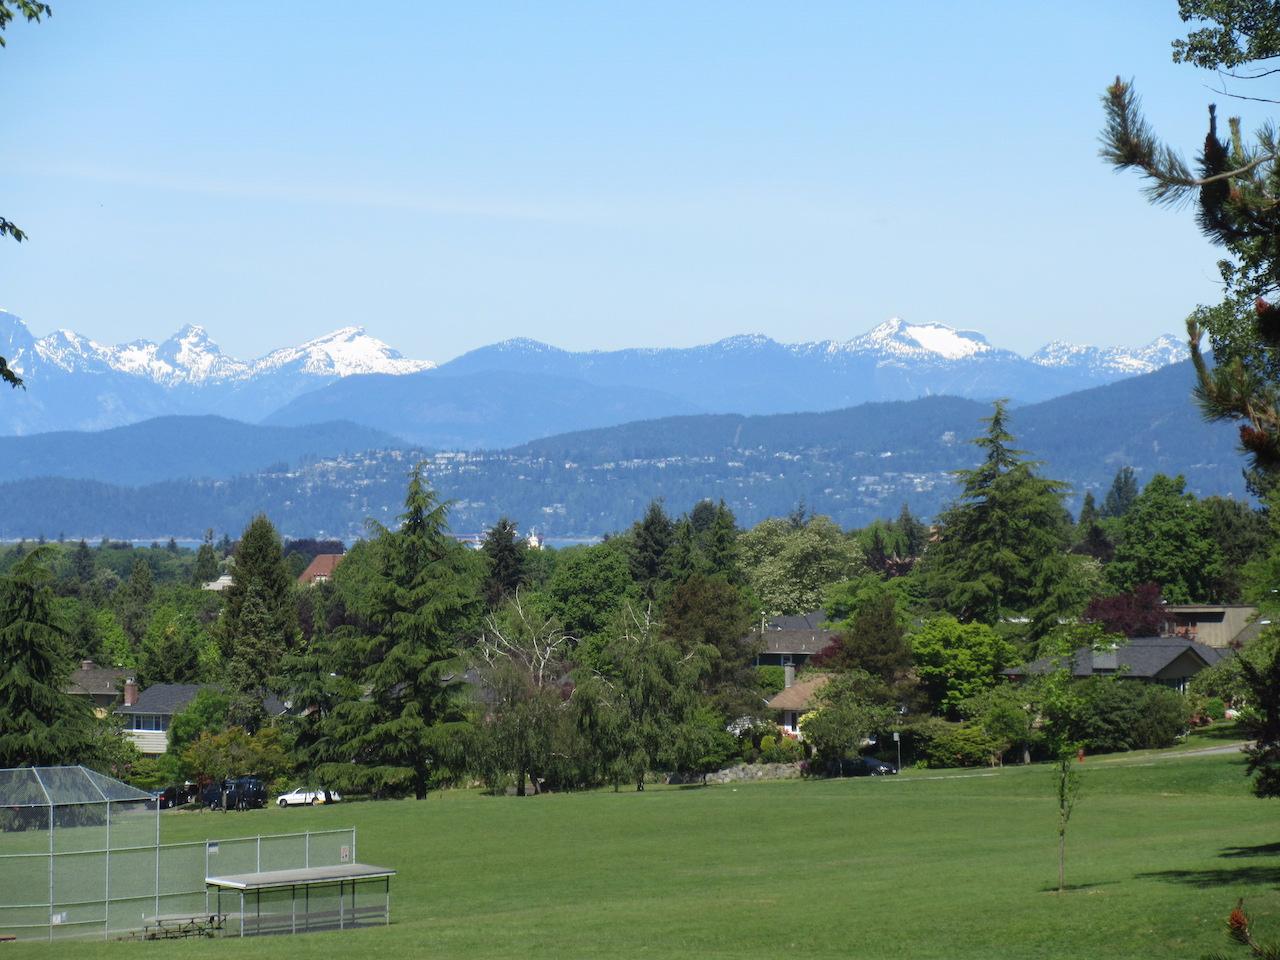 Vancouver Arbutus MacKenzie Heights Urban Park